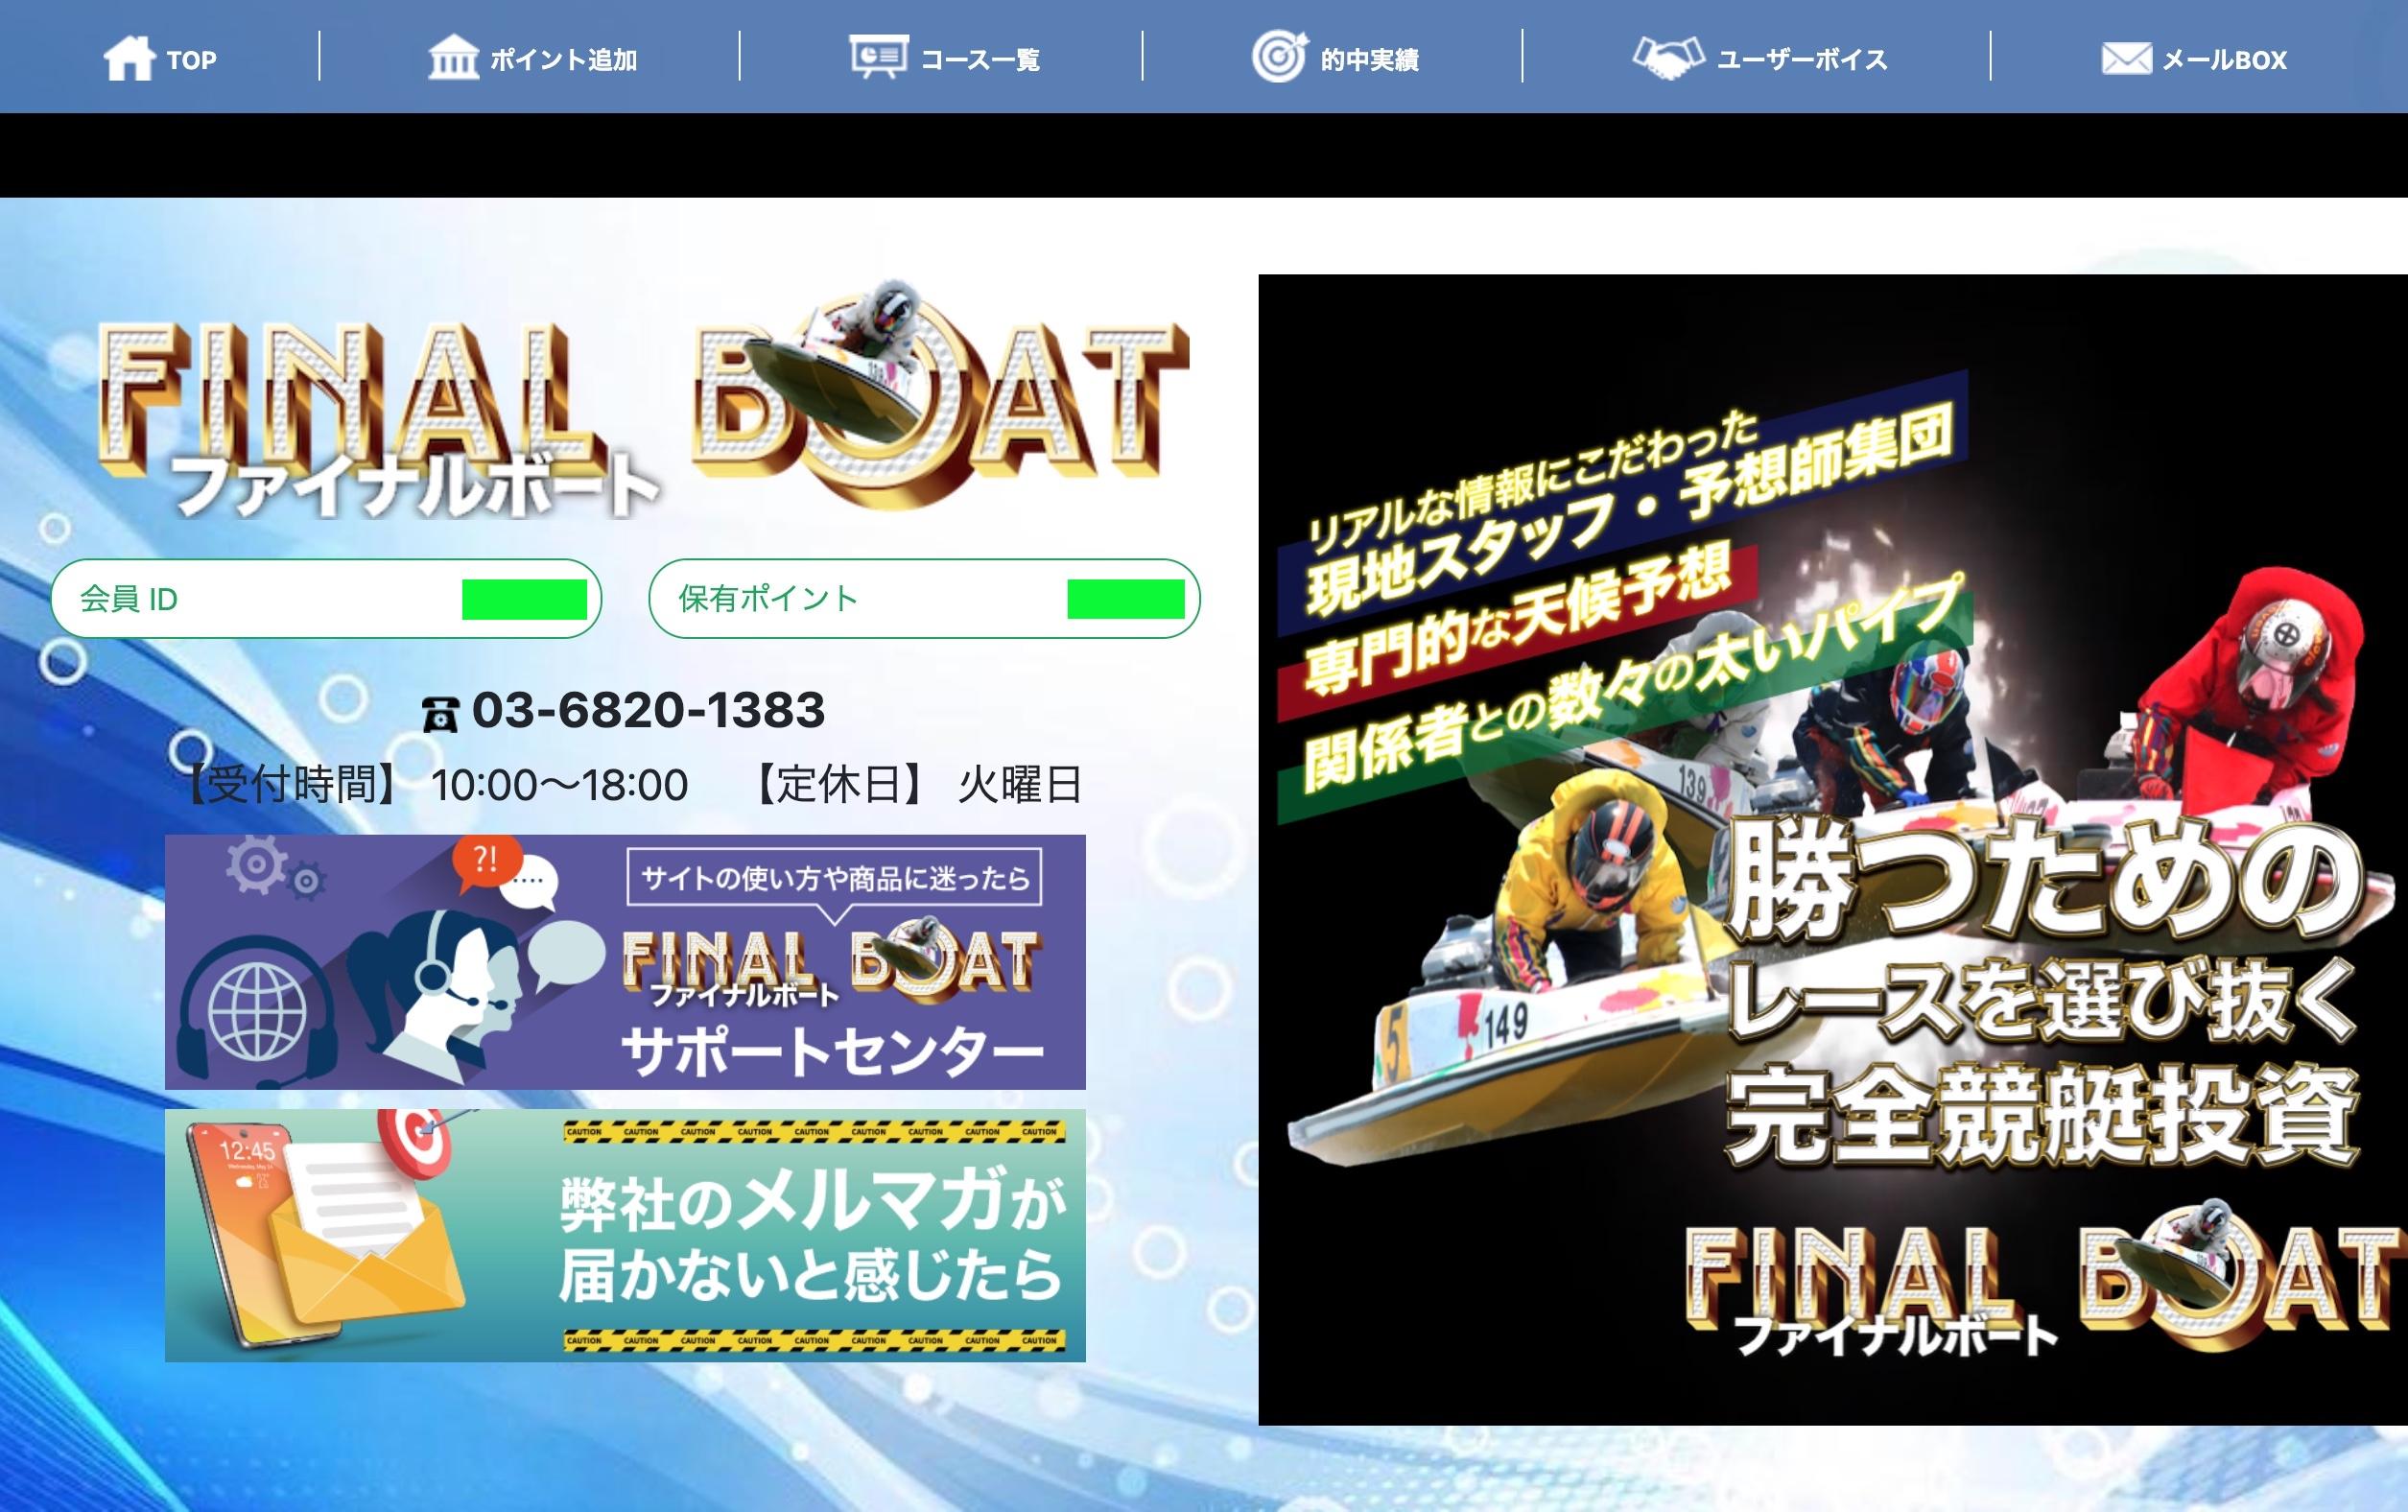 FINALBOAT(ファイナルボート)18